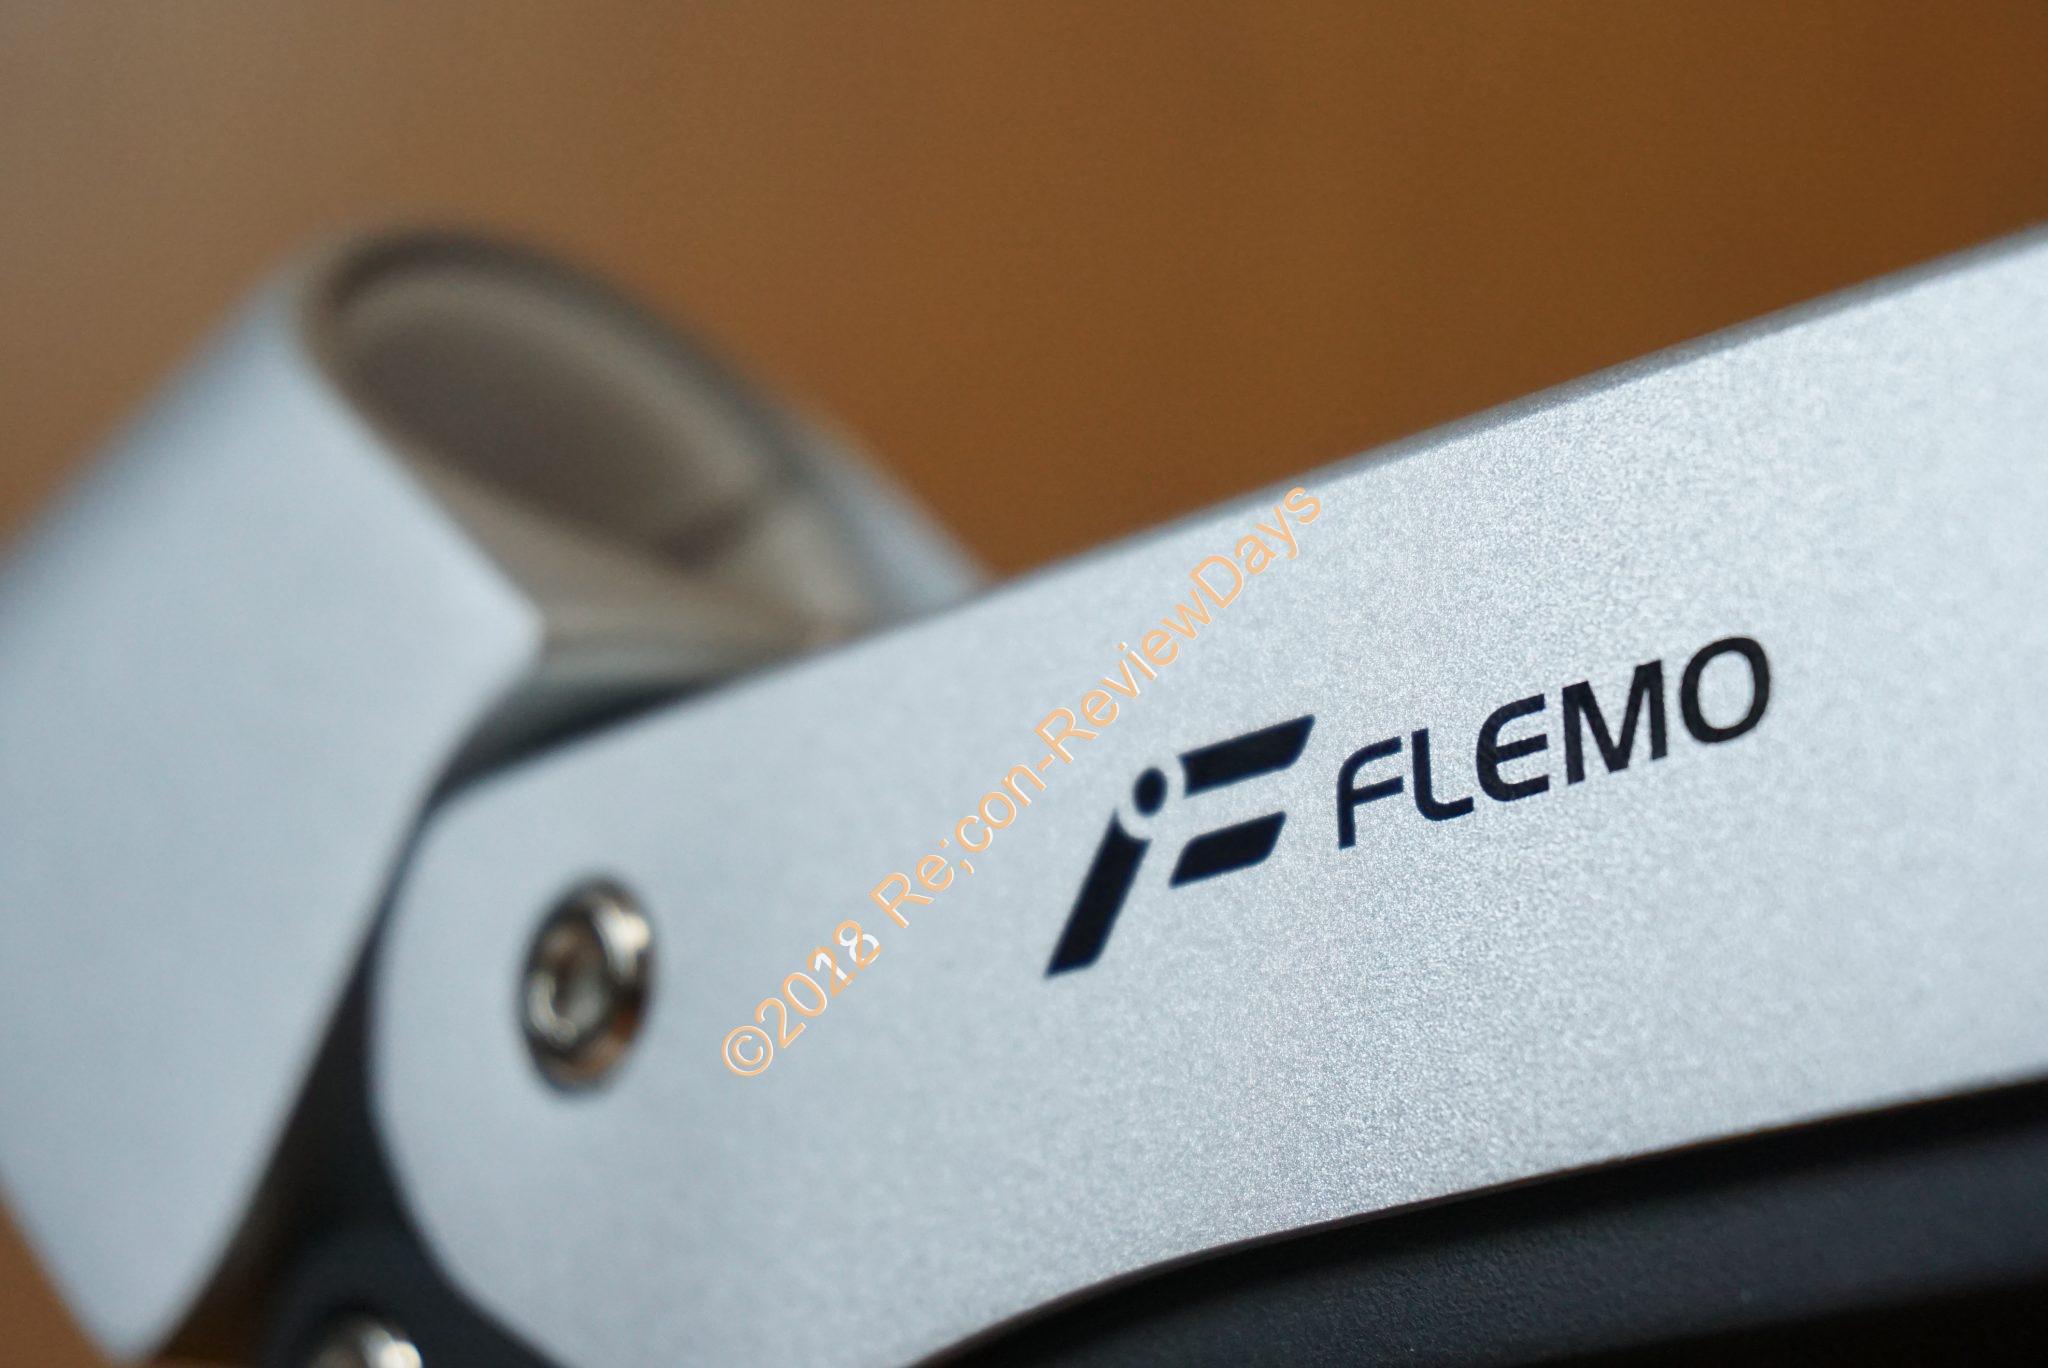 TEKWIND シングルモニターアーム「FLEMO FLM-DSA01」をチェックする #TEKWIND #テックウィンド #モニターアーム